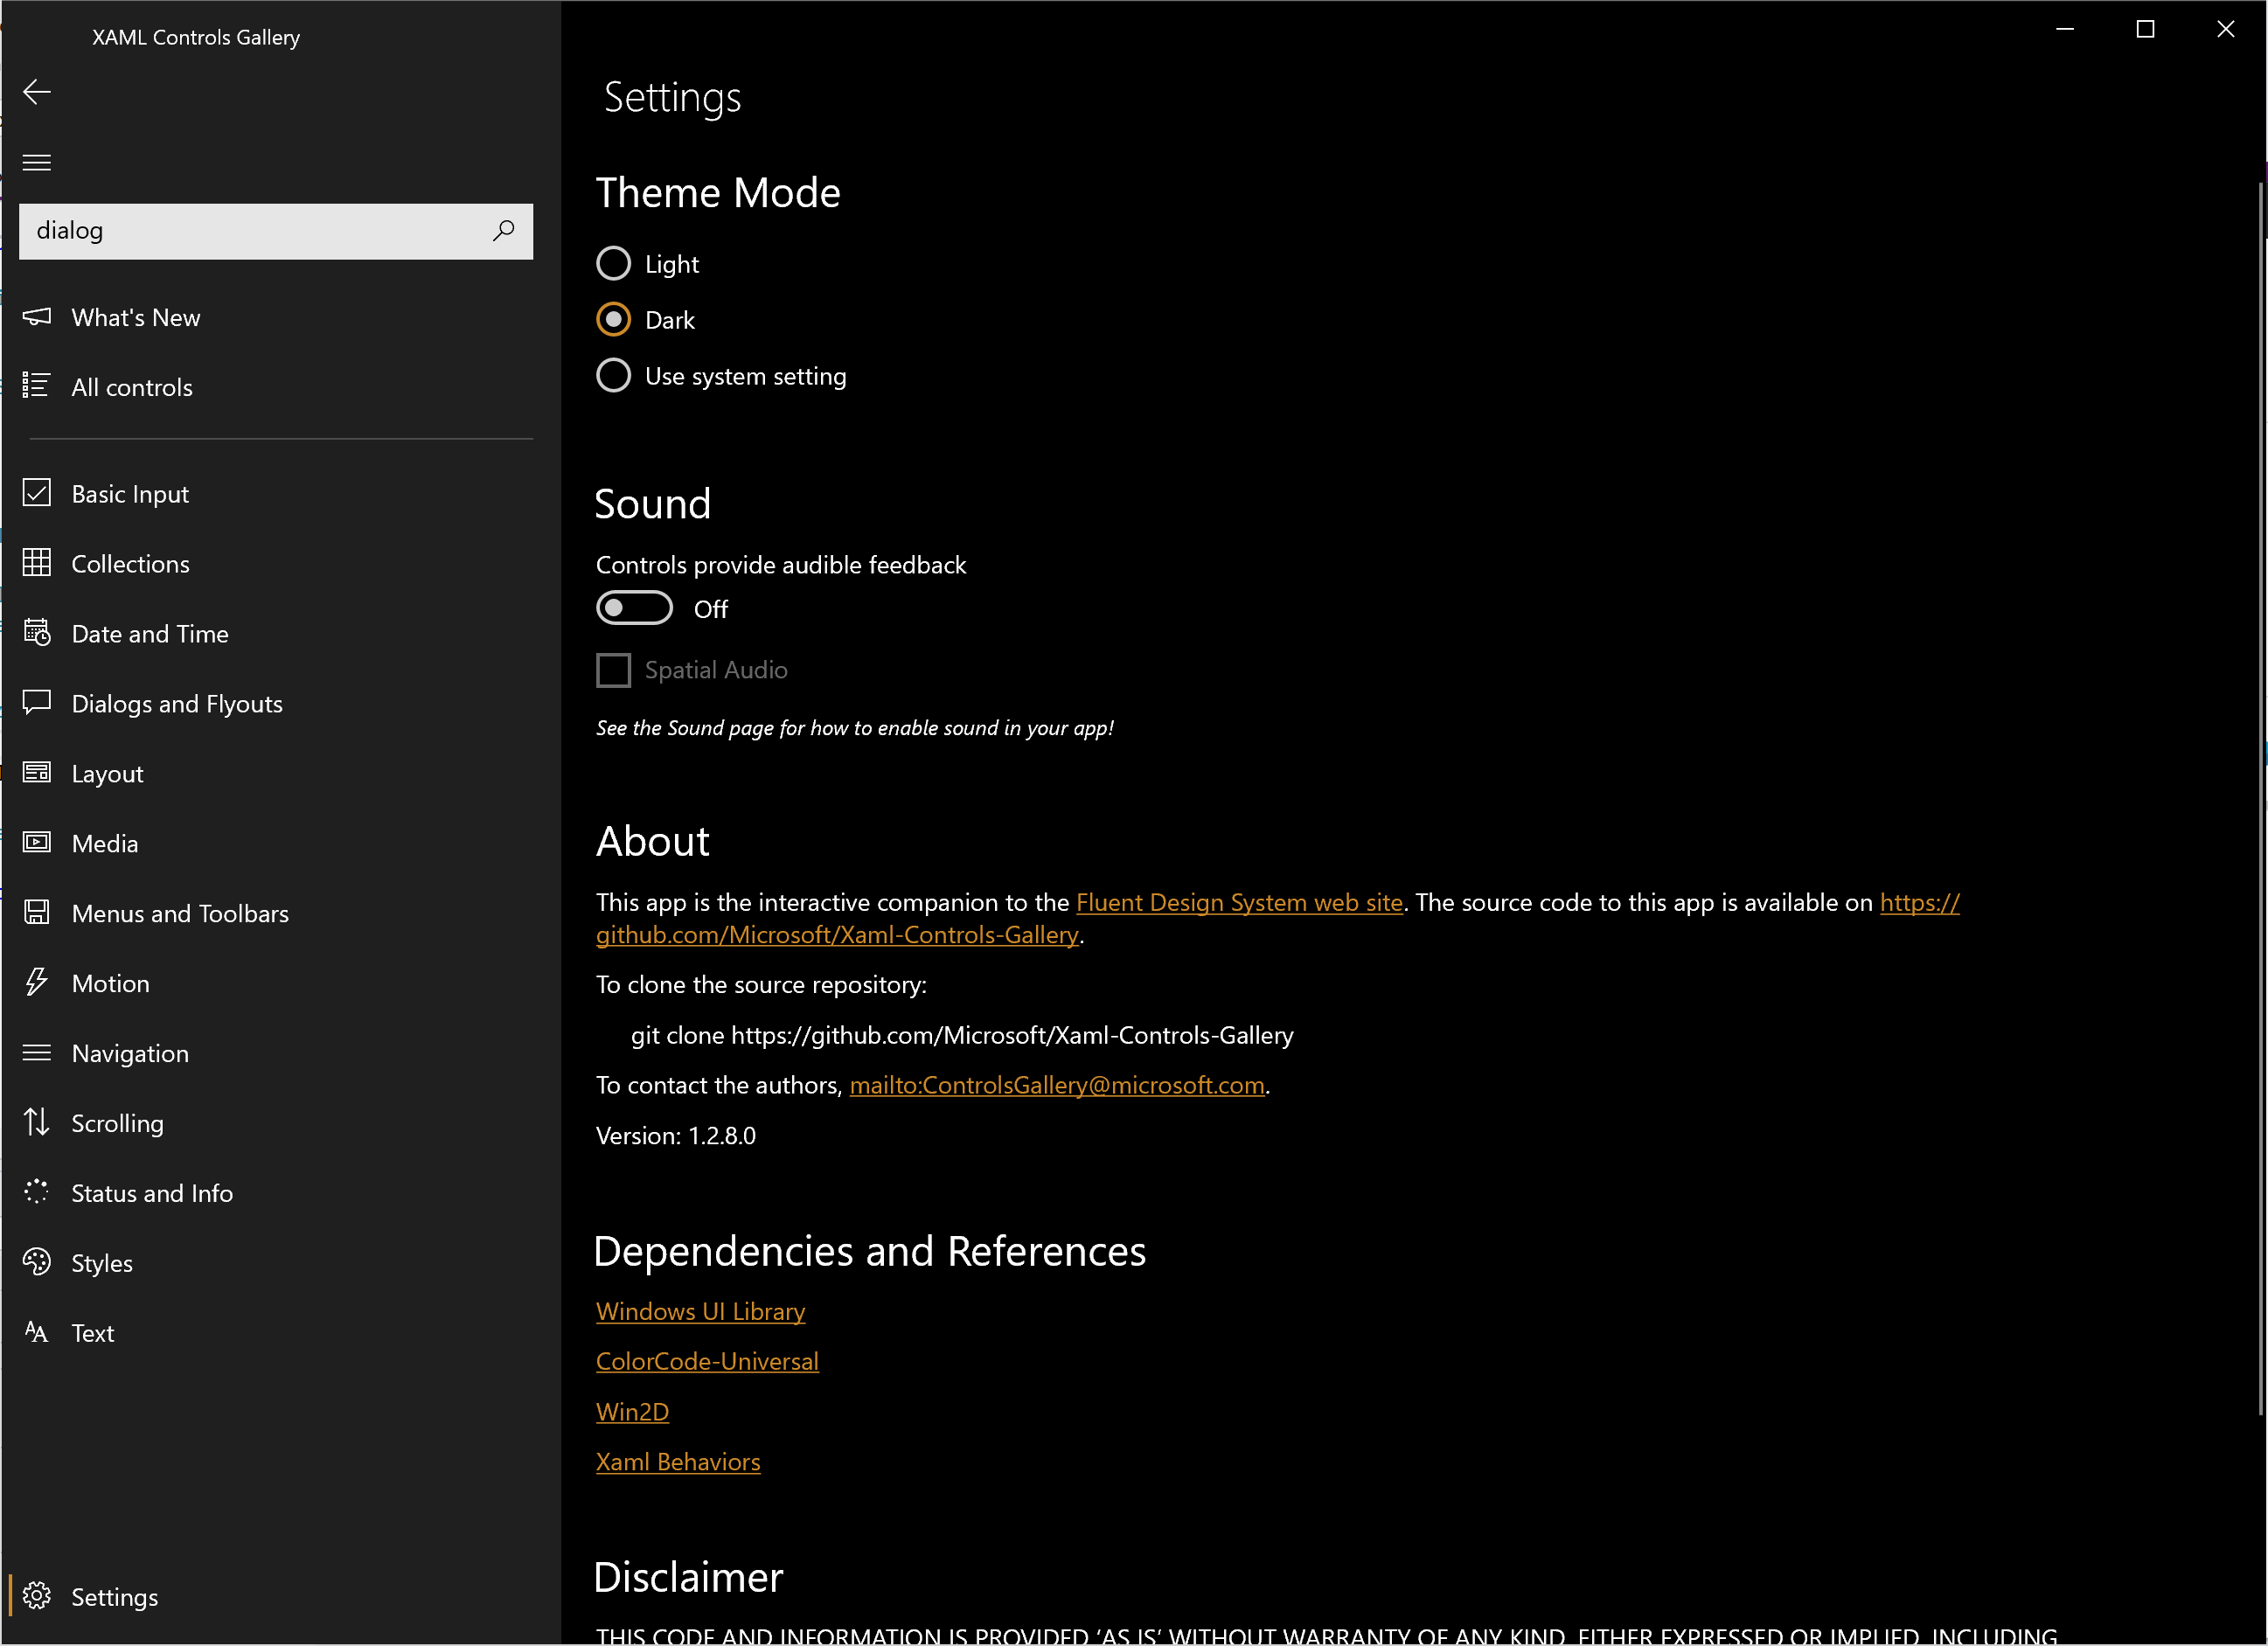 Dark Theme for ContentDialog · Issue #126 · microsoft/Xaml